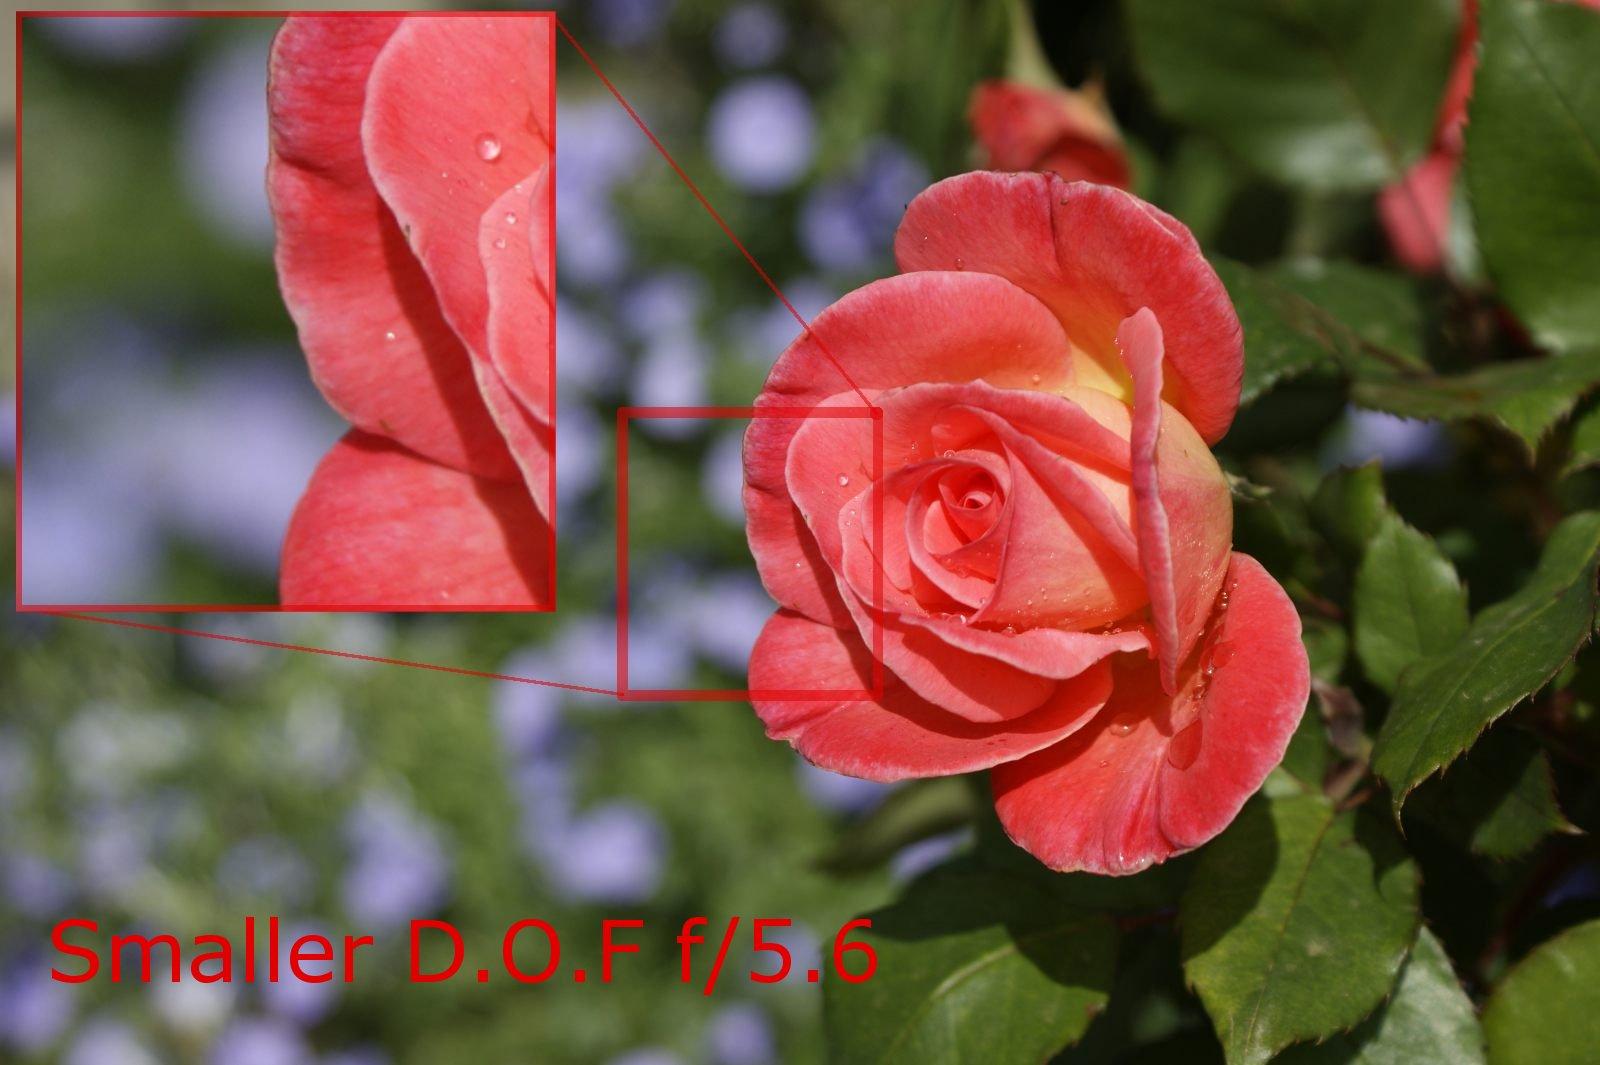 Shallower D.O.F f/5.6